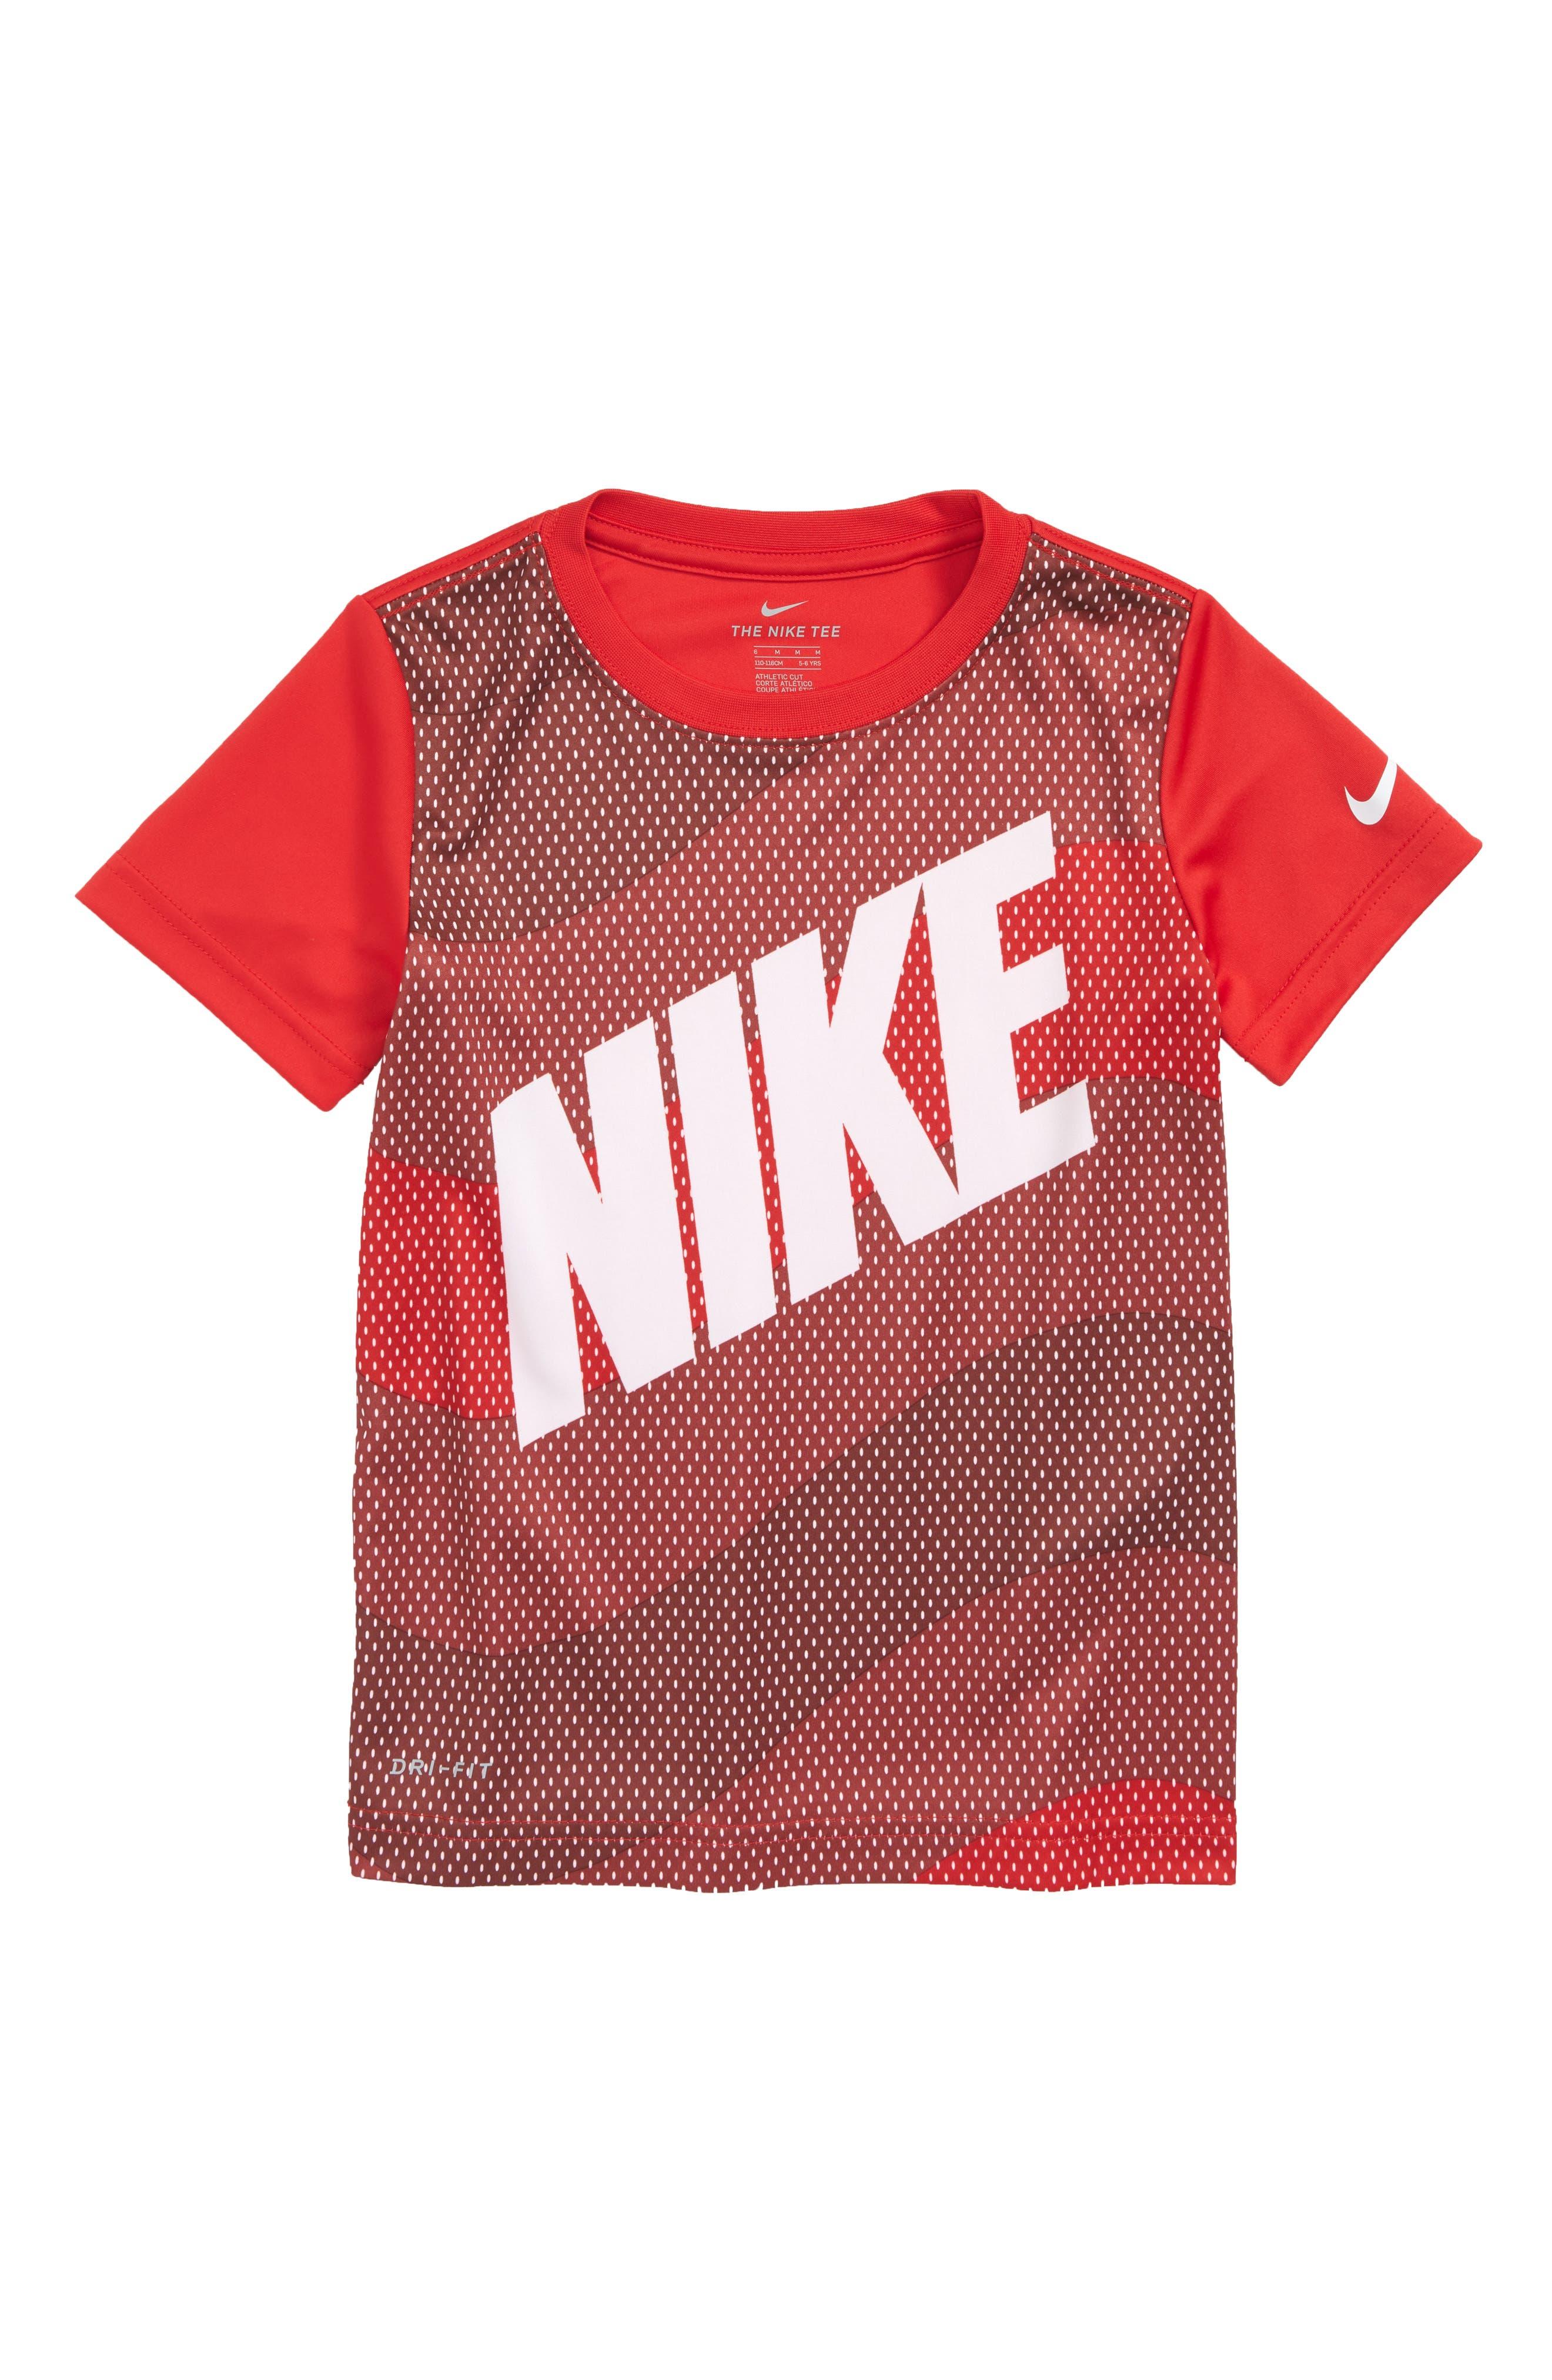 Nike Dry Wavey Mesh Graphic T-Shirt (Toddler Boys & Little Boys)